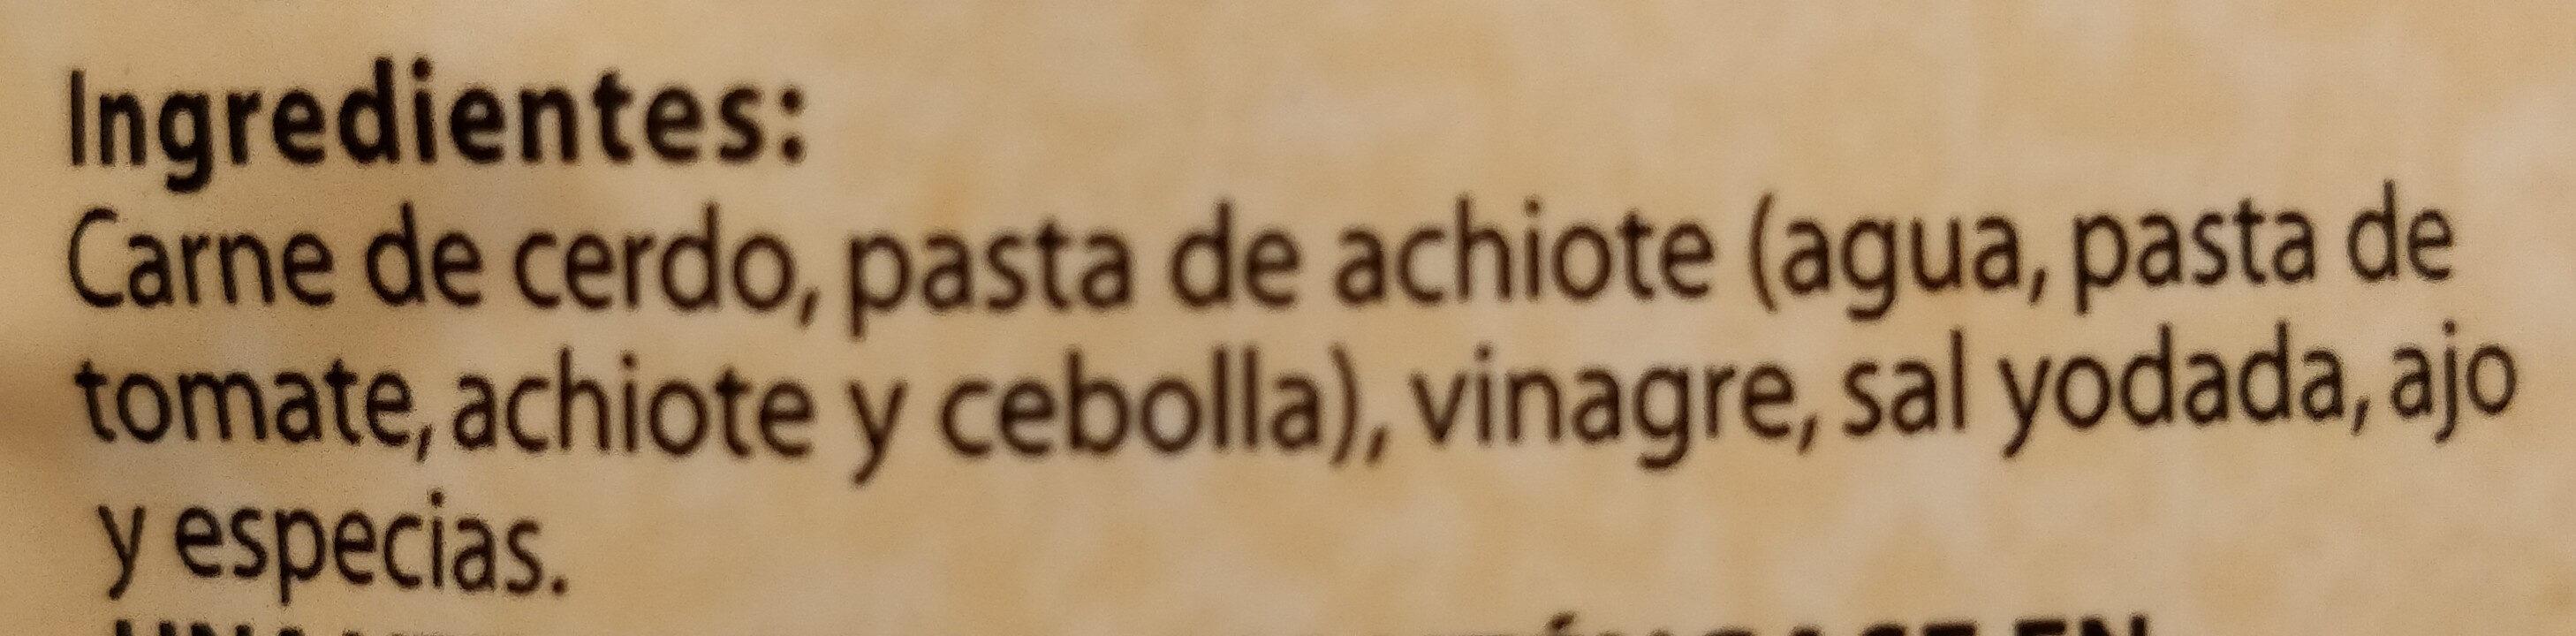 Chata, cochinita pibil shredded pork meat - Ingredients - en